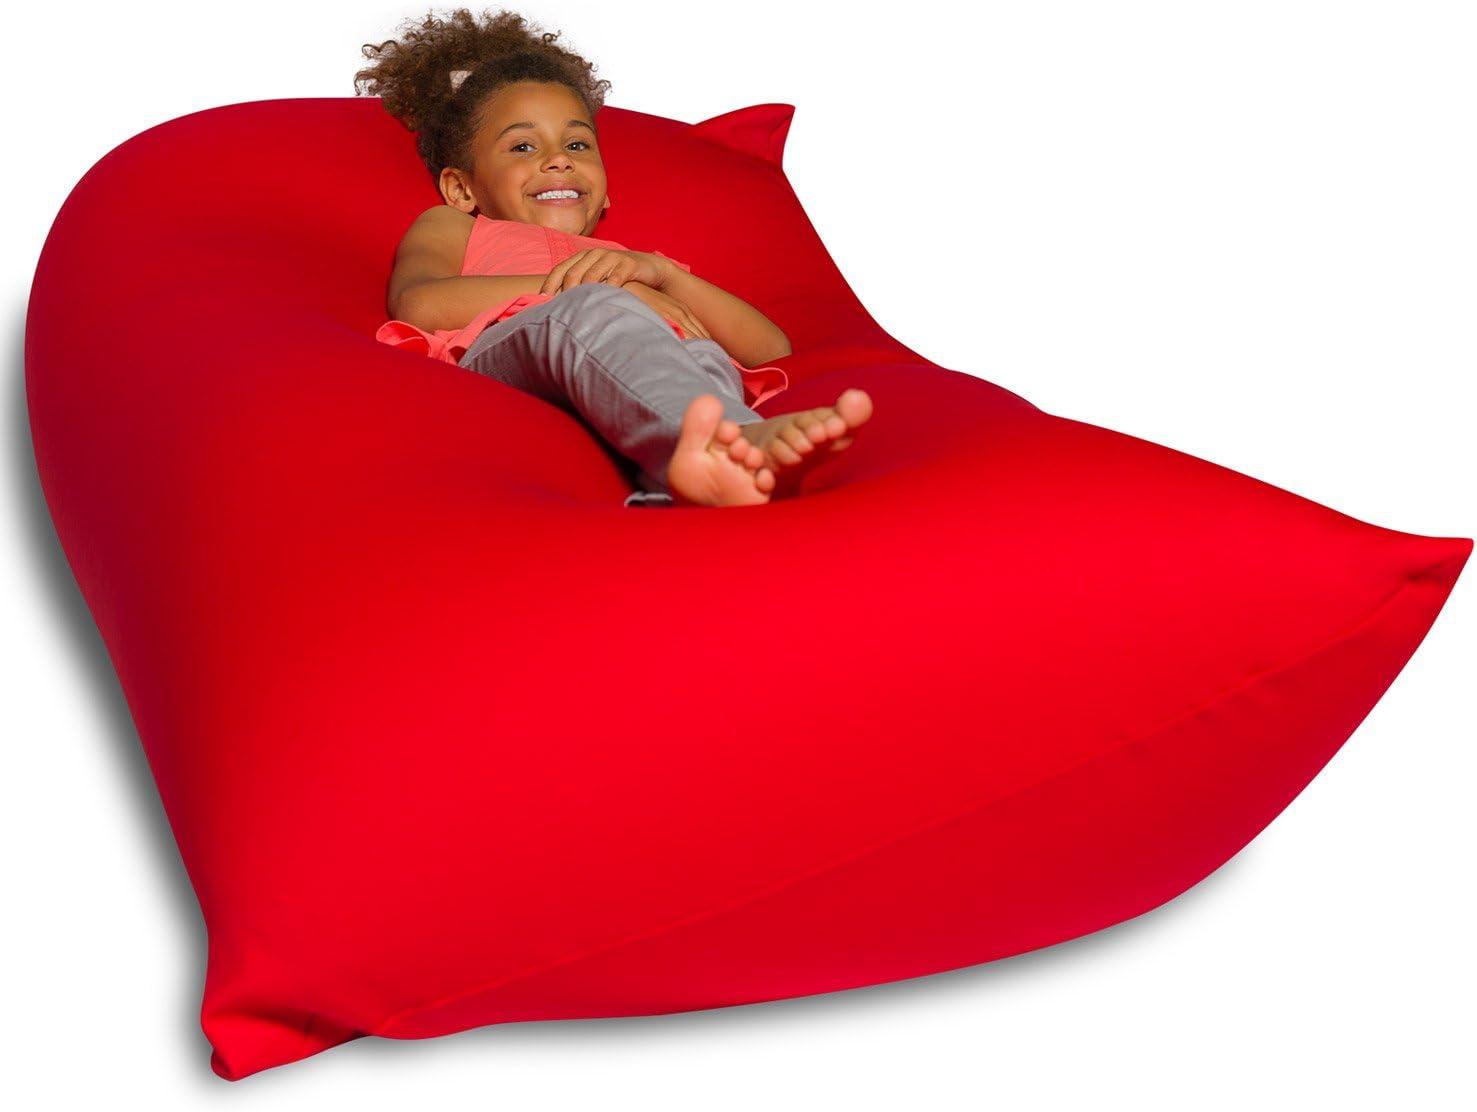 Big Squishy Portable and Stylish Bean Bag Chair, Medium, Red